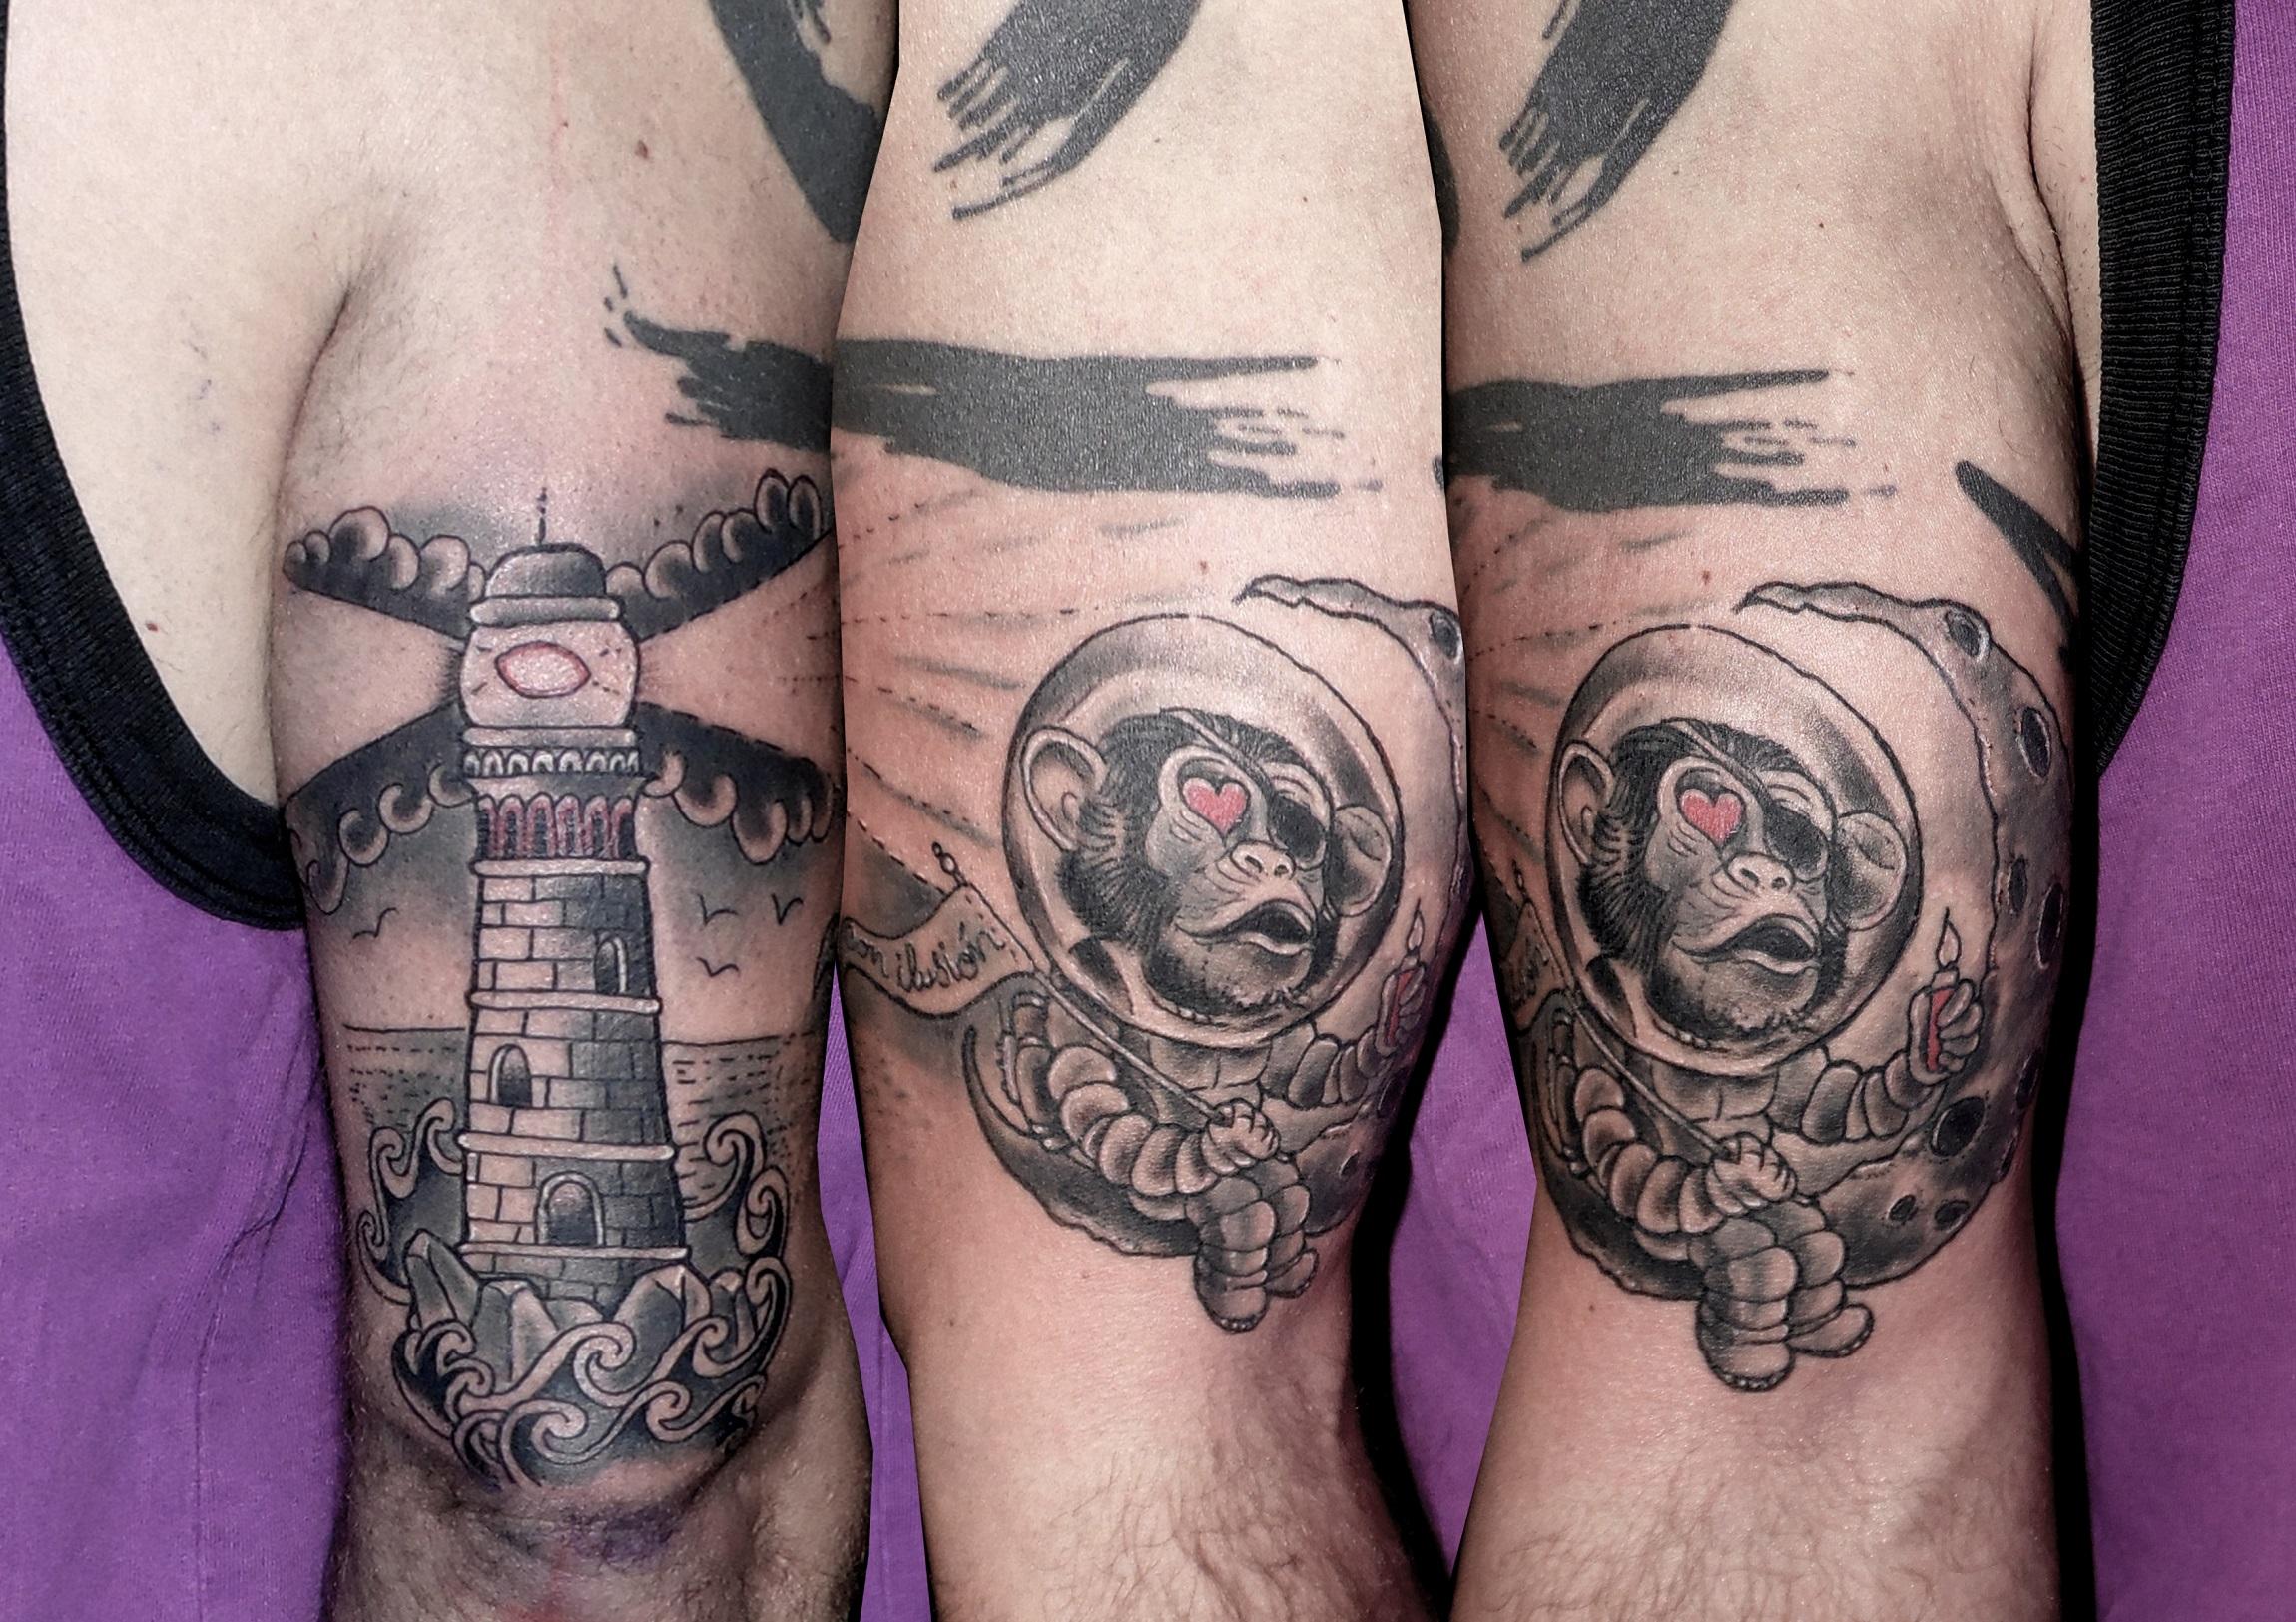 tatuaje tattoo faro mono astronauta luna brazo blanco negro comic tradicional 13depicas jaca huesca